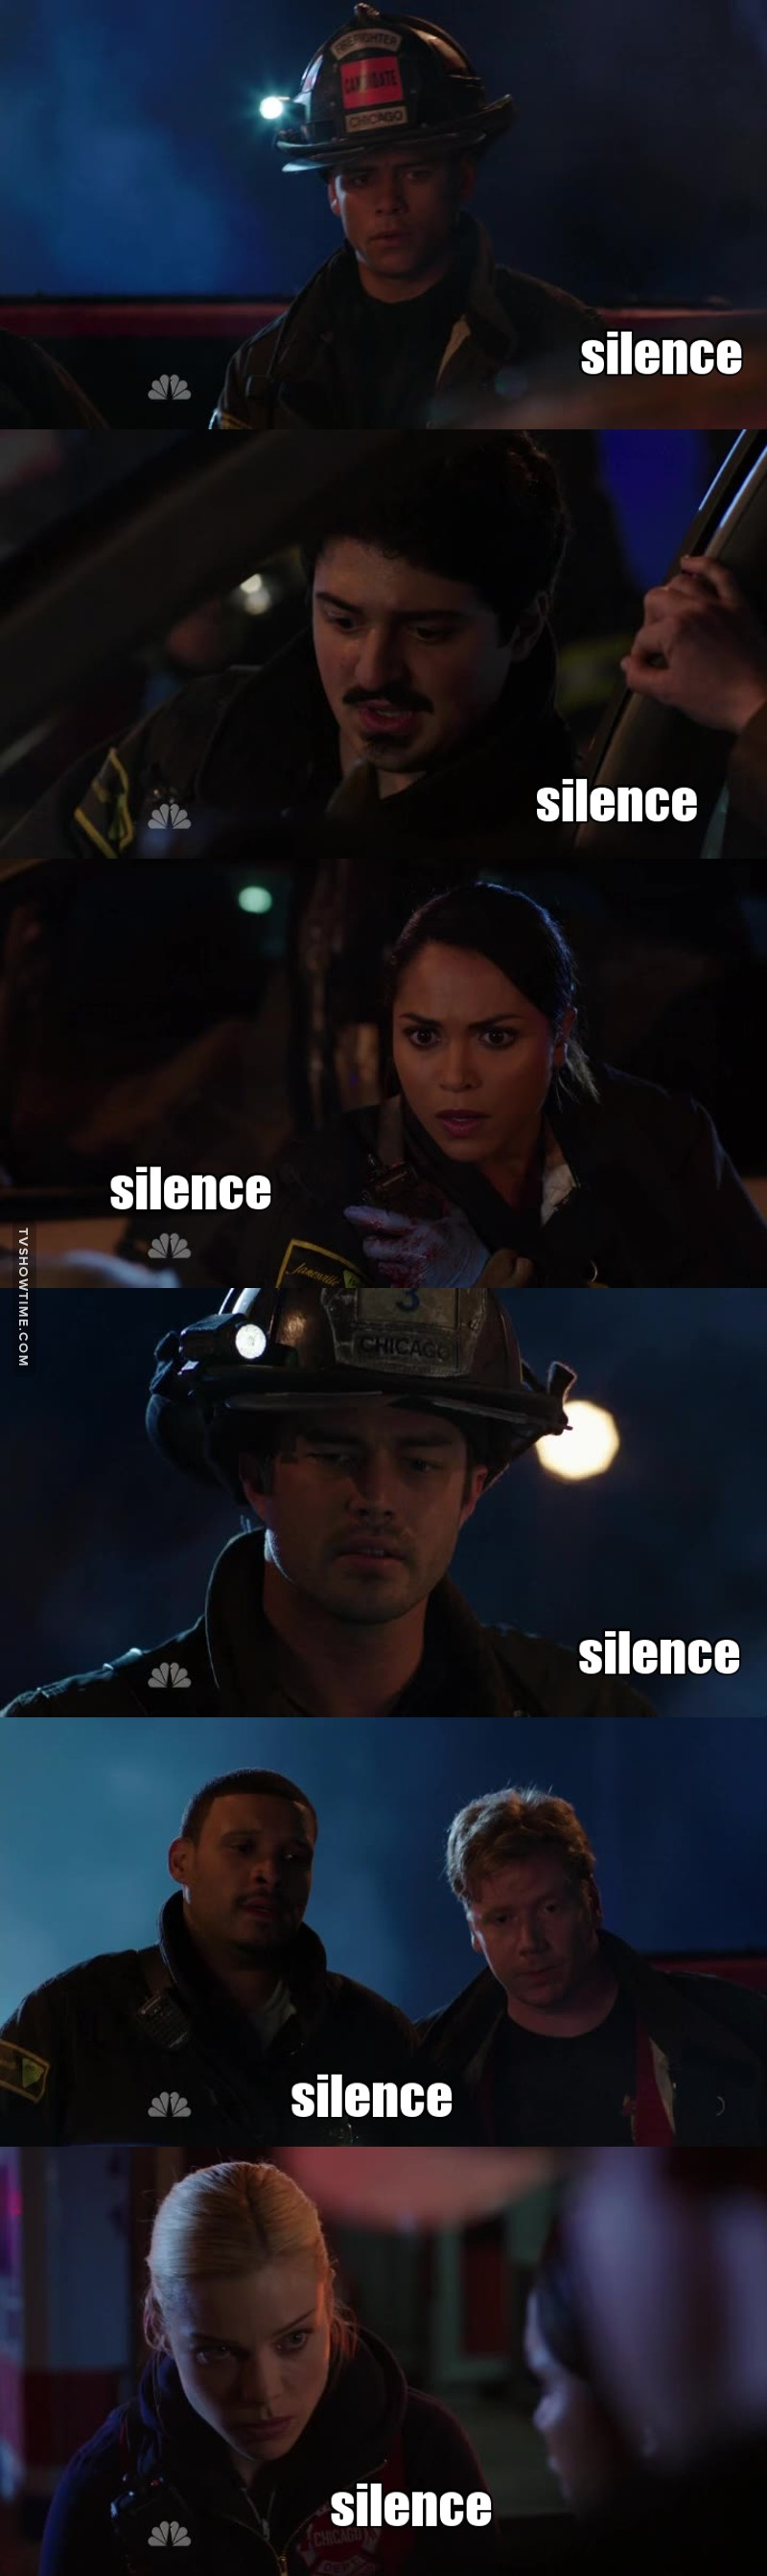 Explosive silence